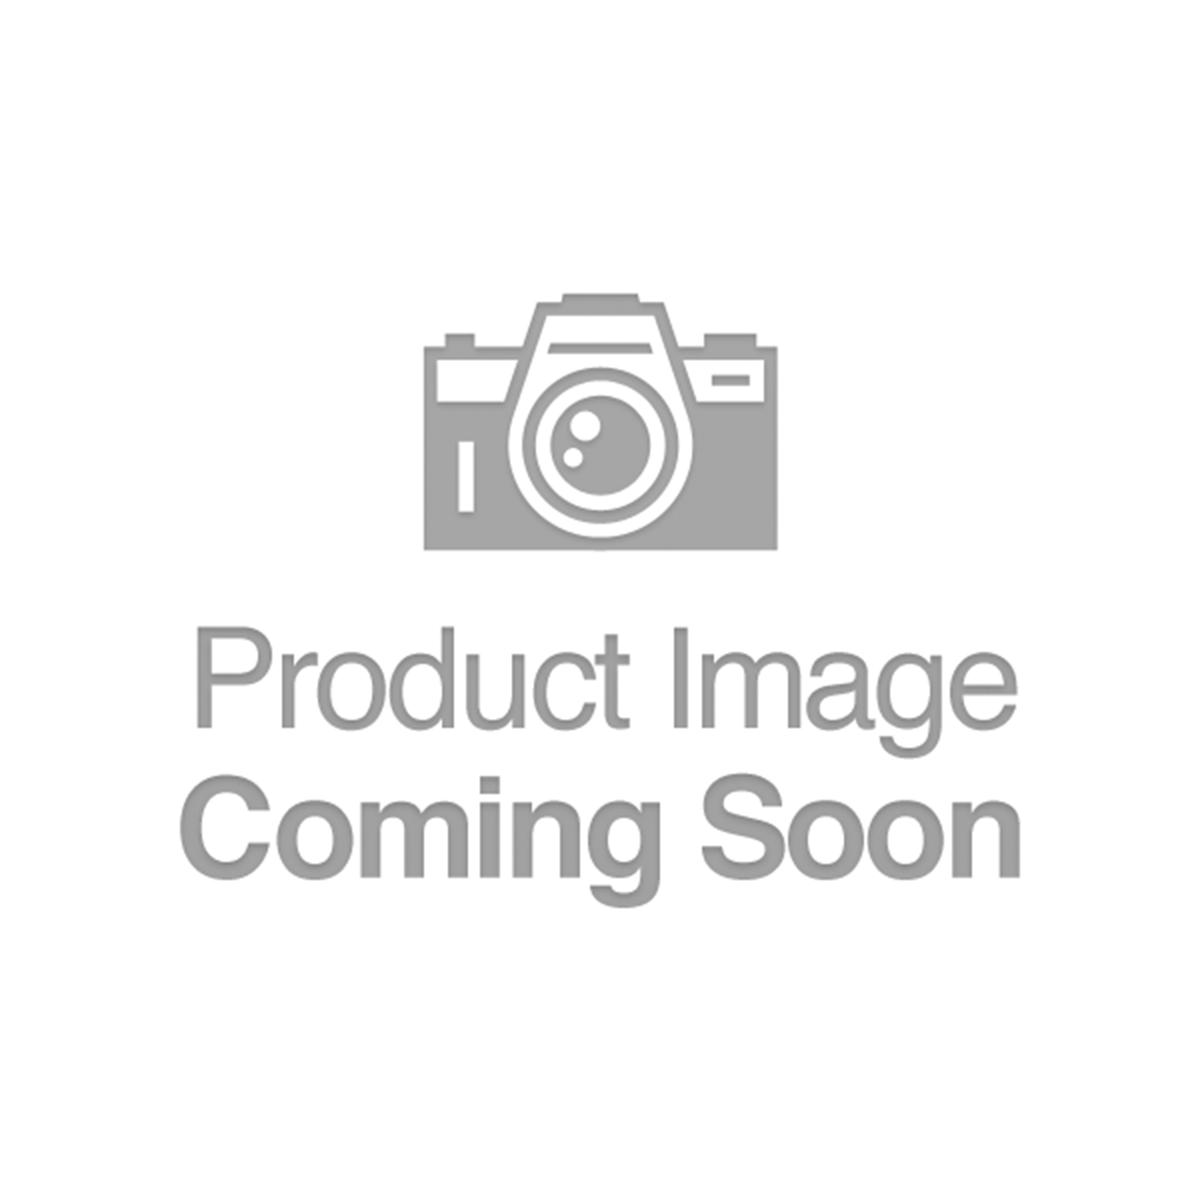 FR 269  $5  1896  Silver Certificate  PMG 35